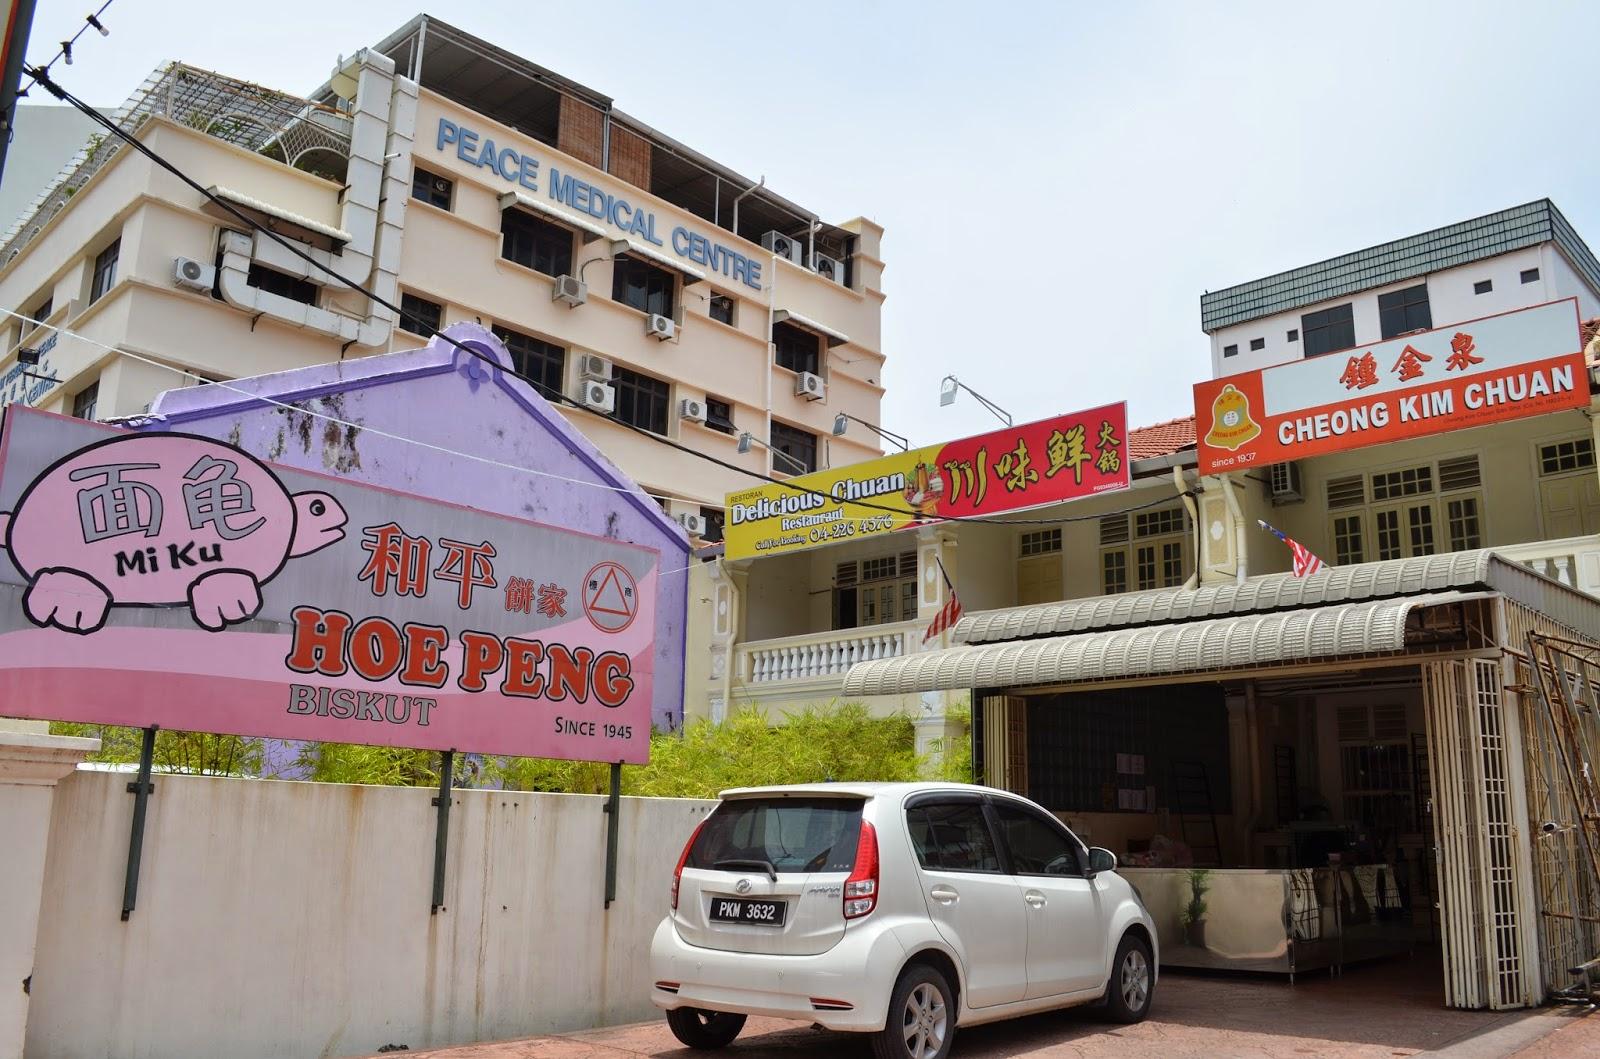 Pn tay 39 s blog cheong kim chuan penang famous tau sar for Terrace 9 classic penang